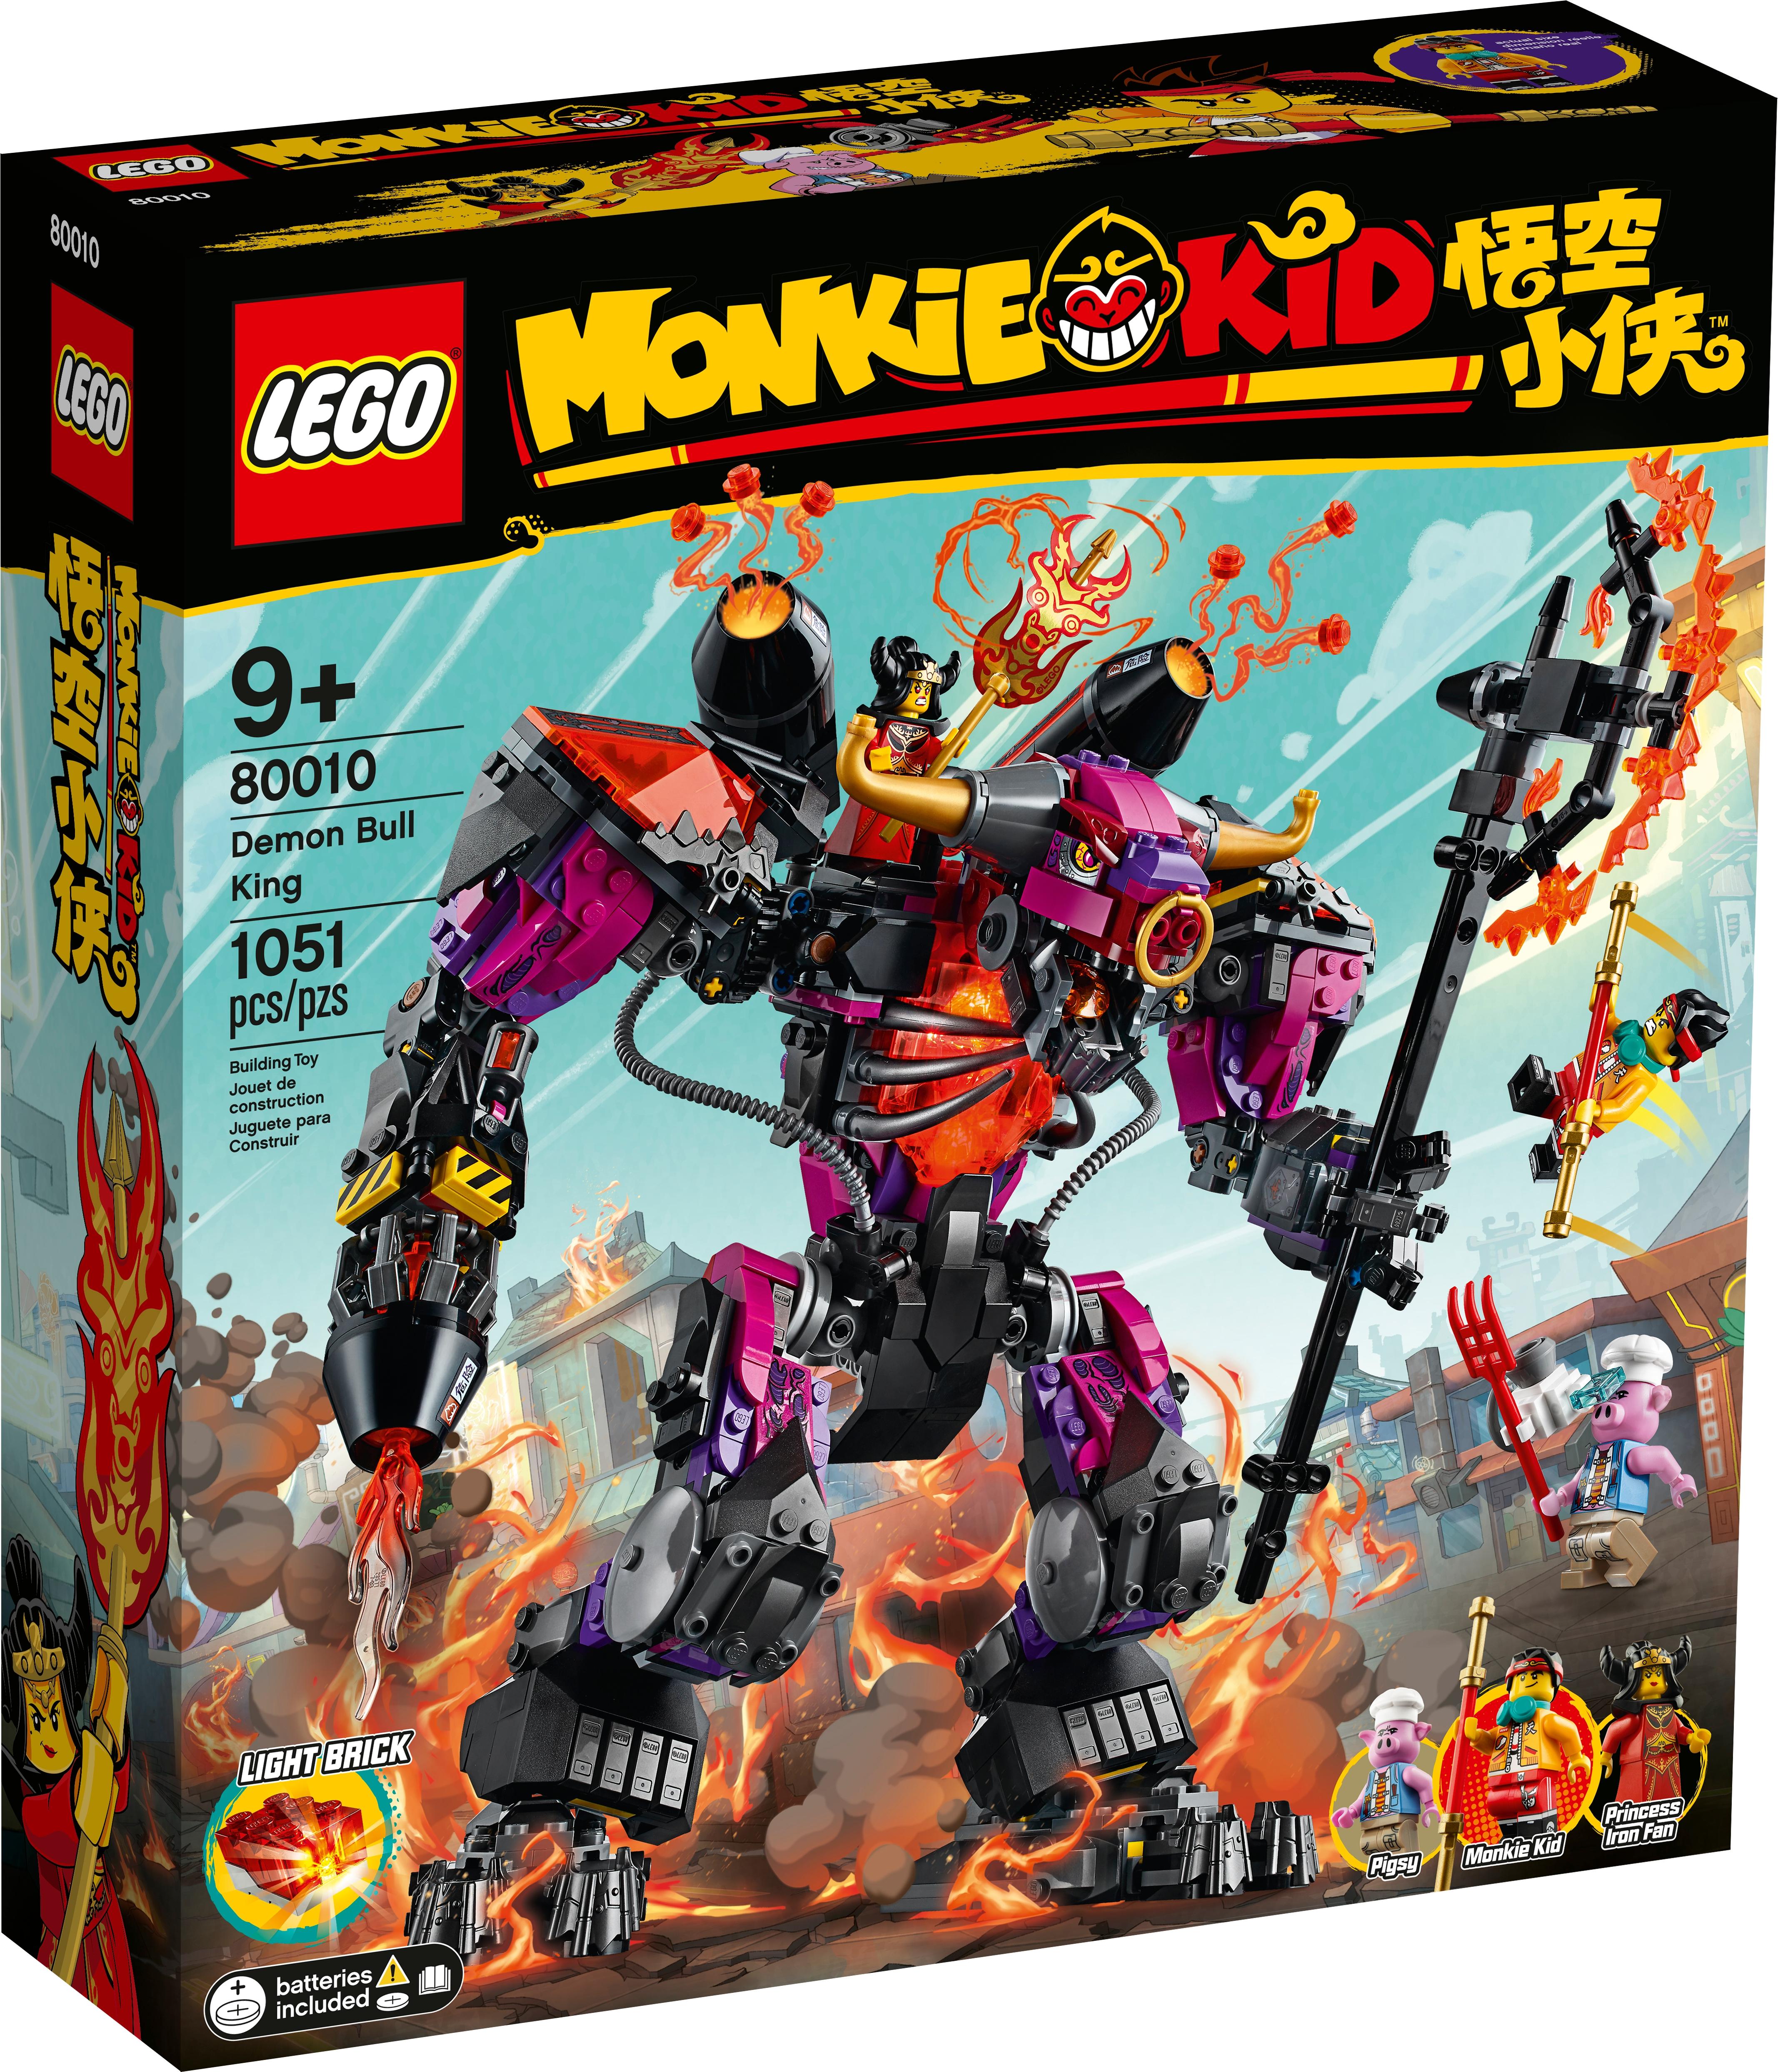 LEGO® Monkie Kid® Pigsy Minifigur aus Set 80010 Demon Bull King 80013 Neu